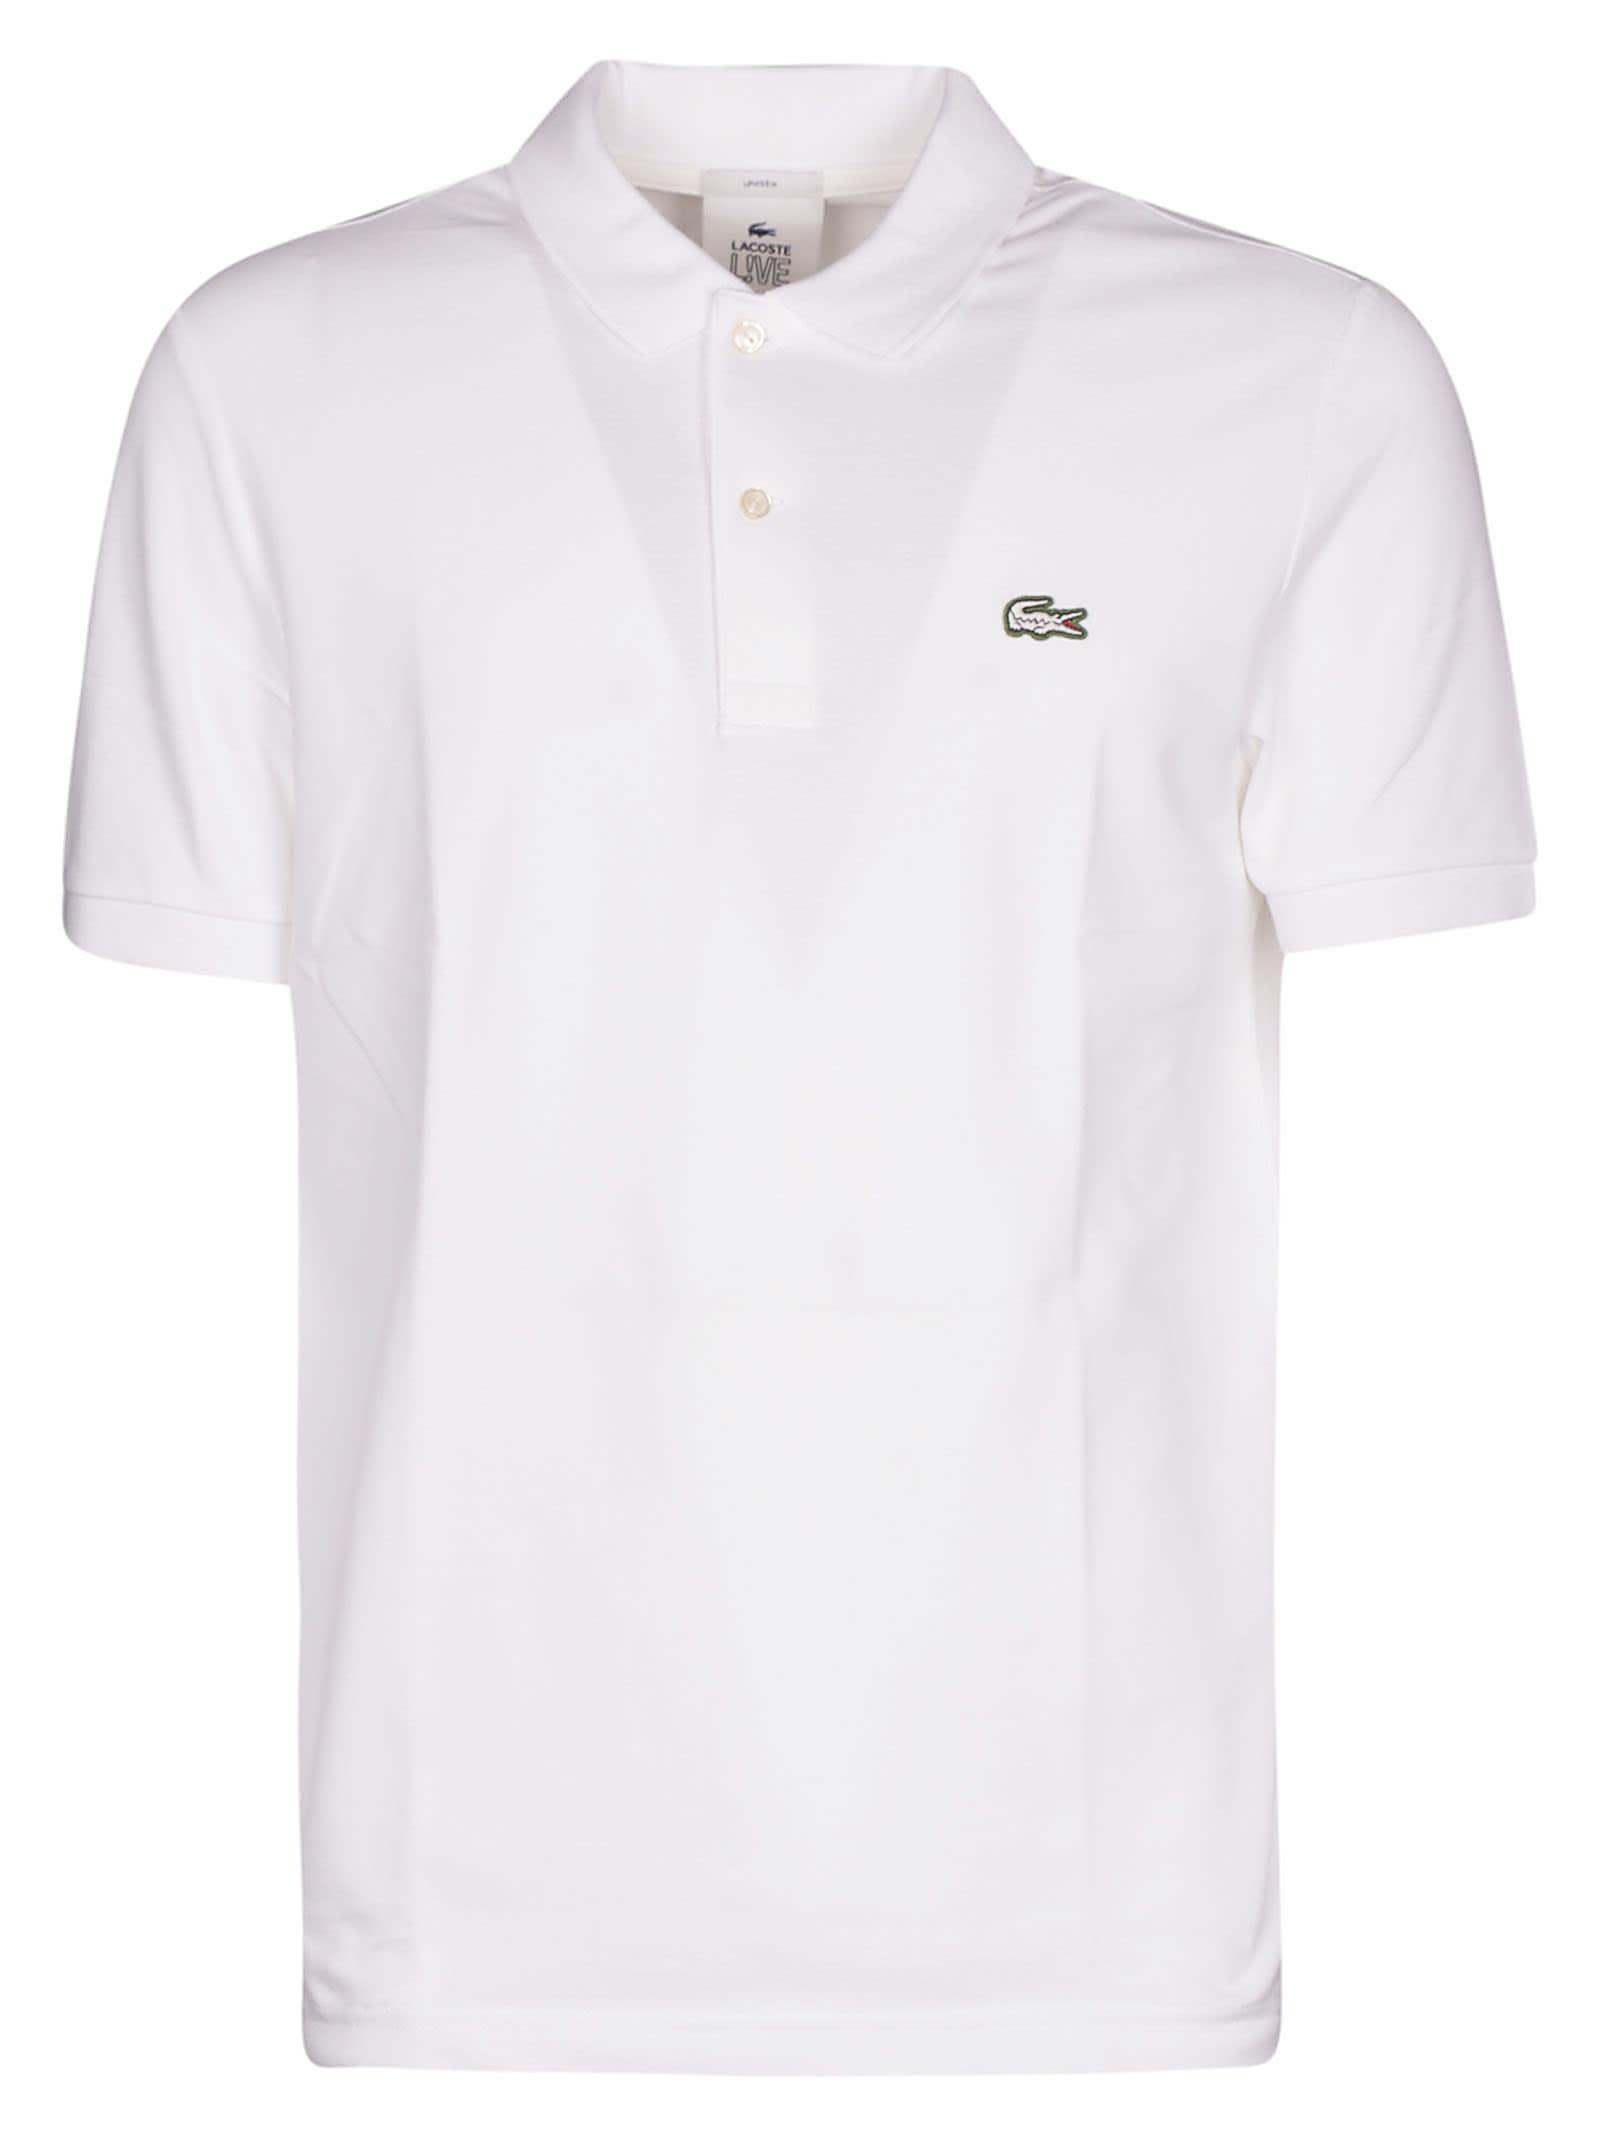 87e44adf Lacoste Logo Patch Polo Shirt